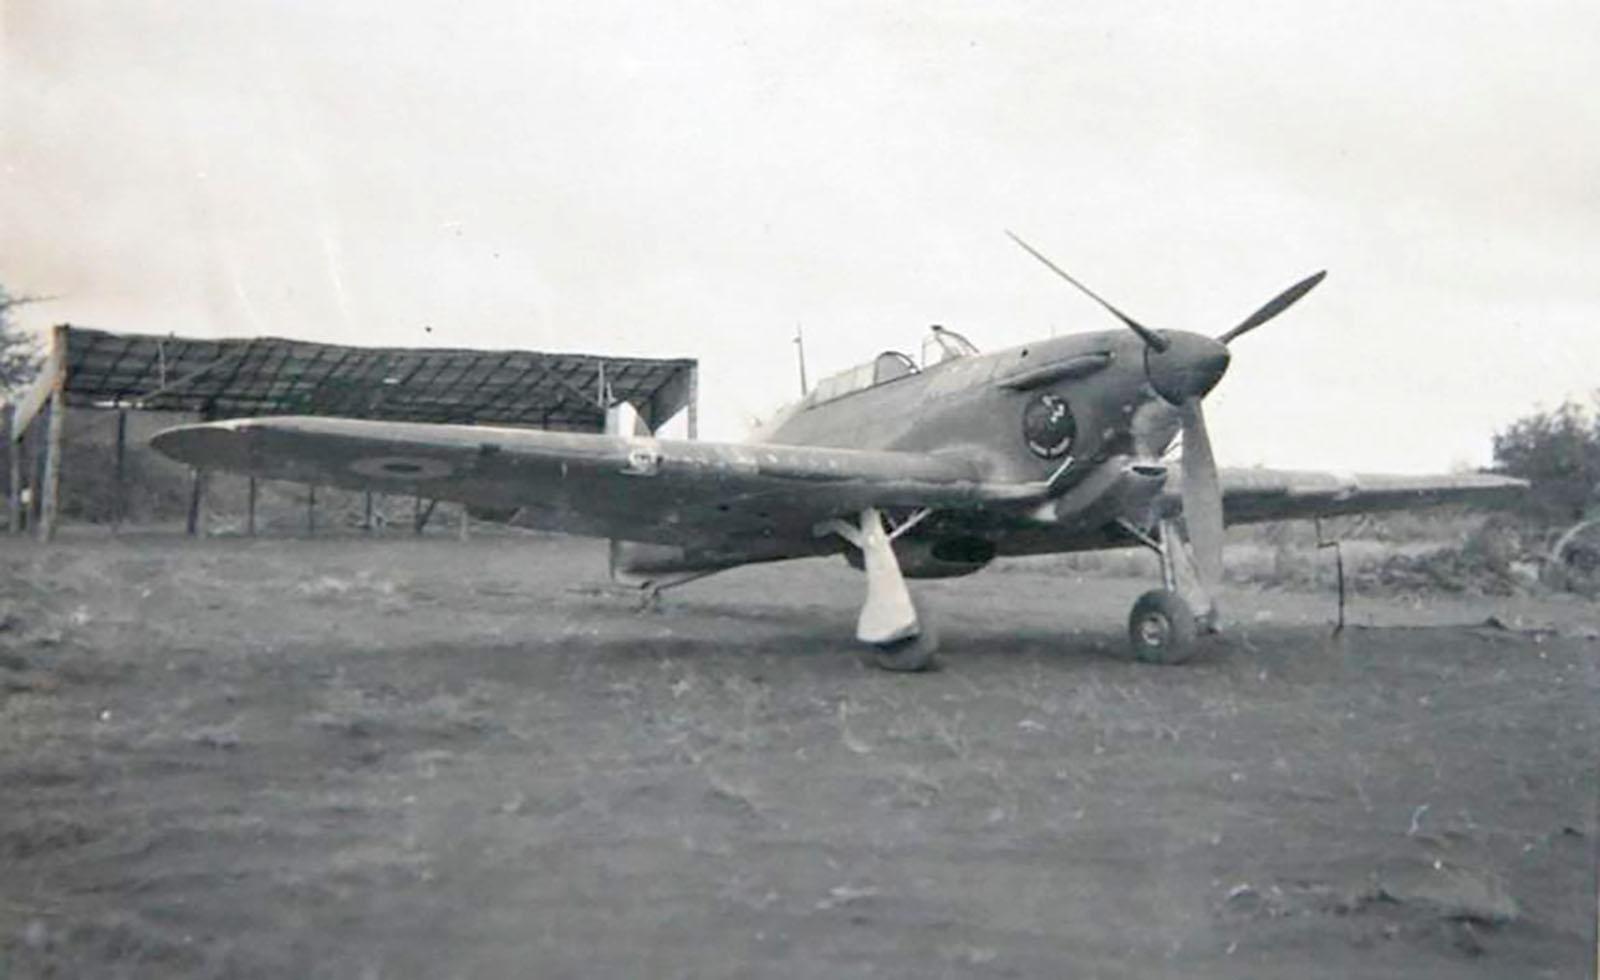 Hurricane I Trop SAAF 3Sqn J Bob Kershaw 284 Dagahbur Ethiopia East Africa March 1941 01